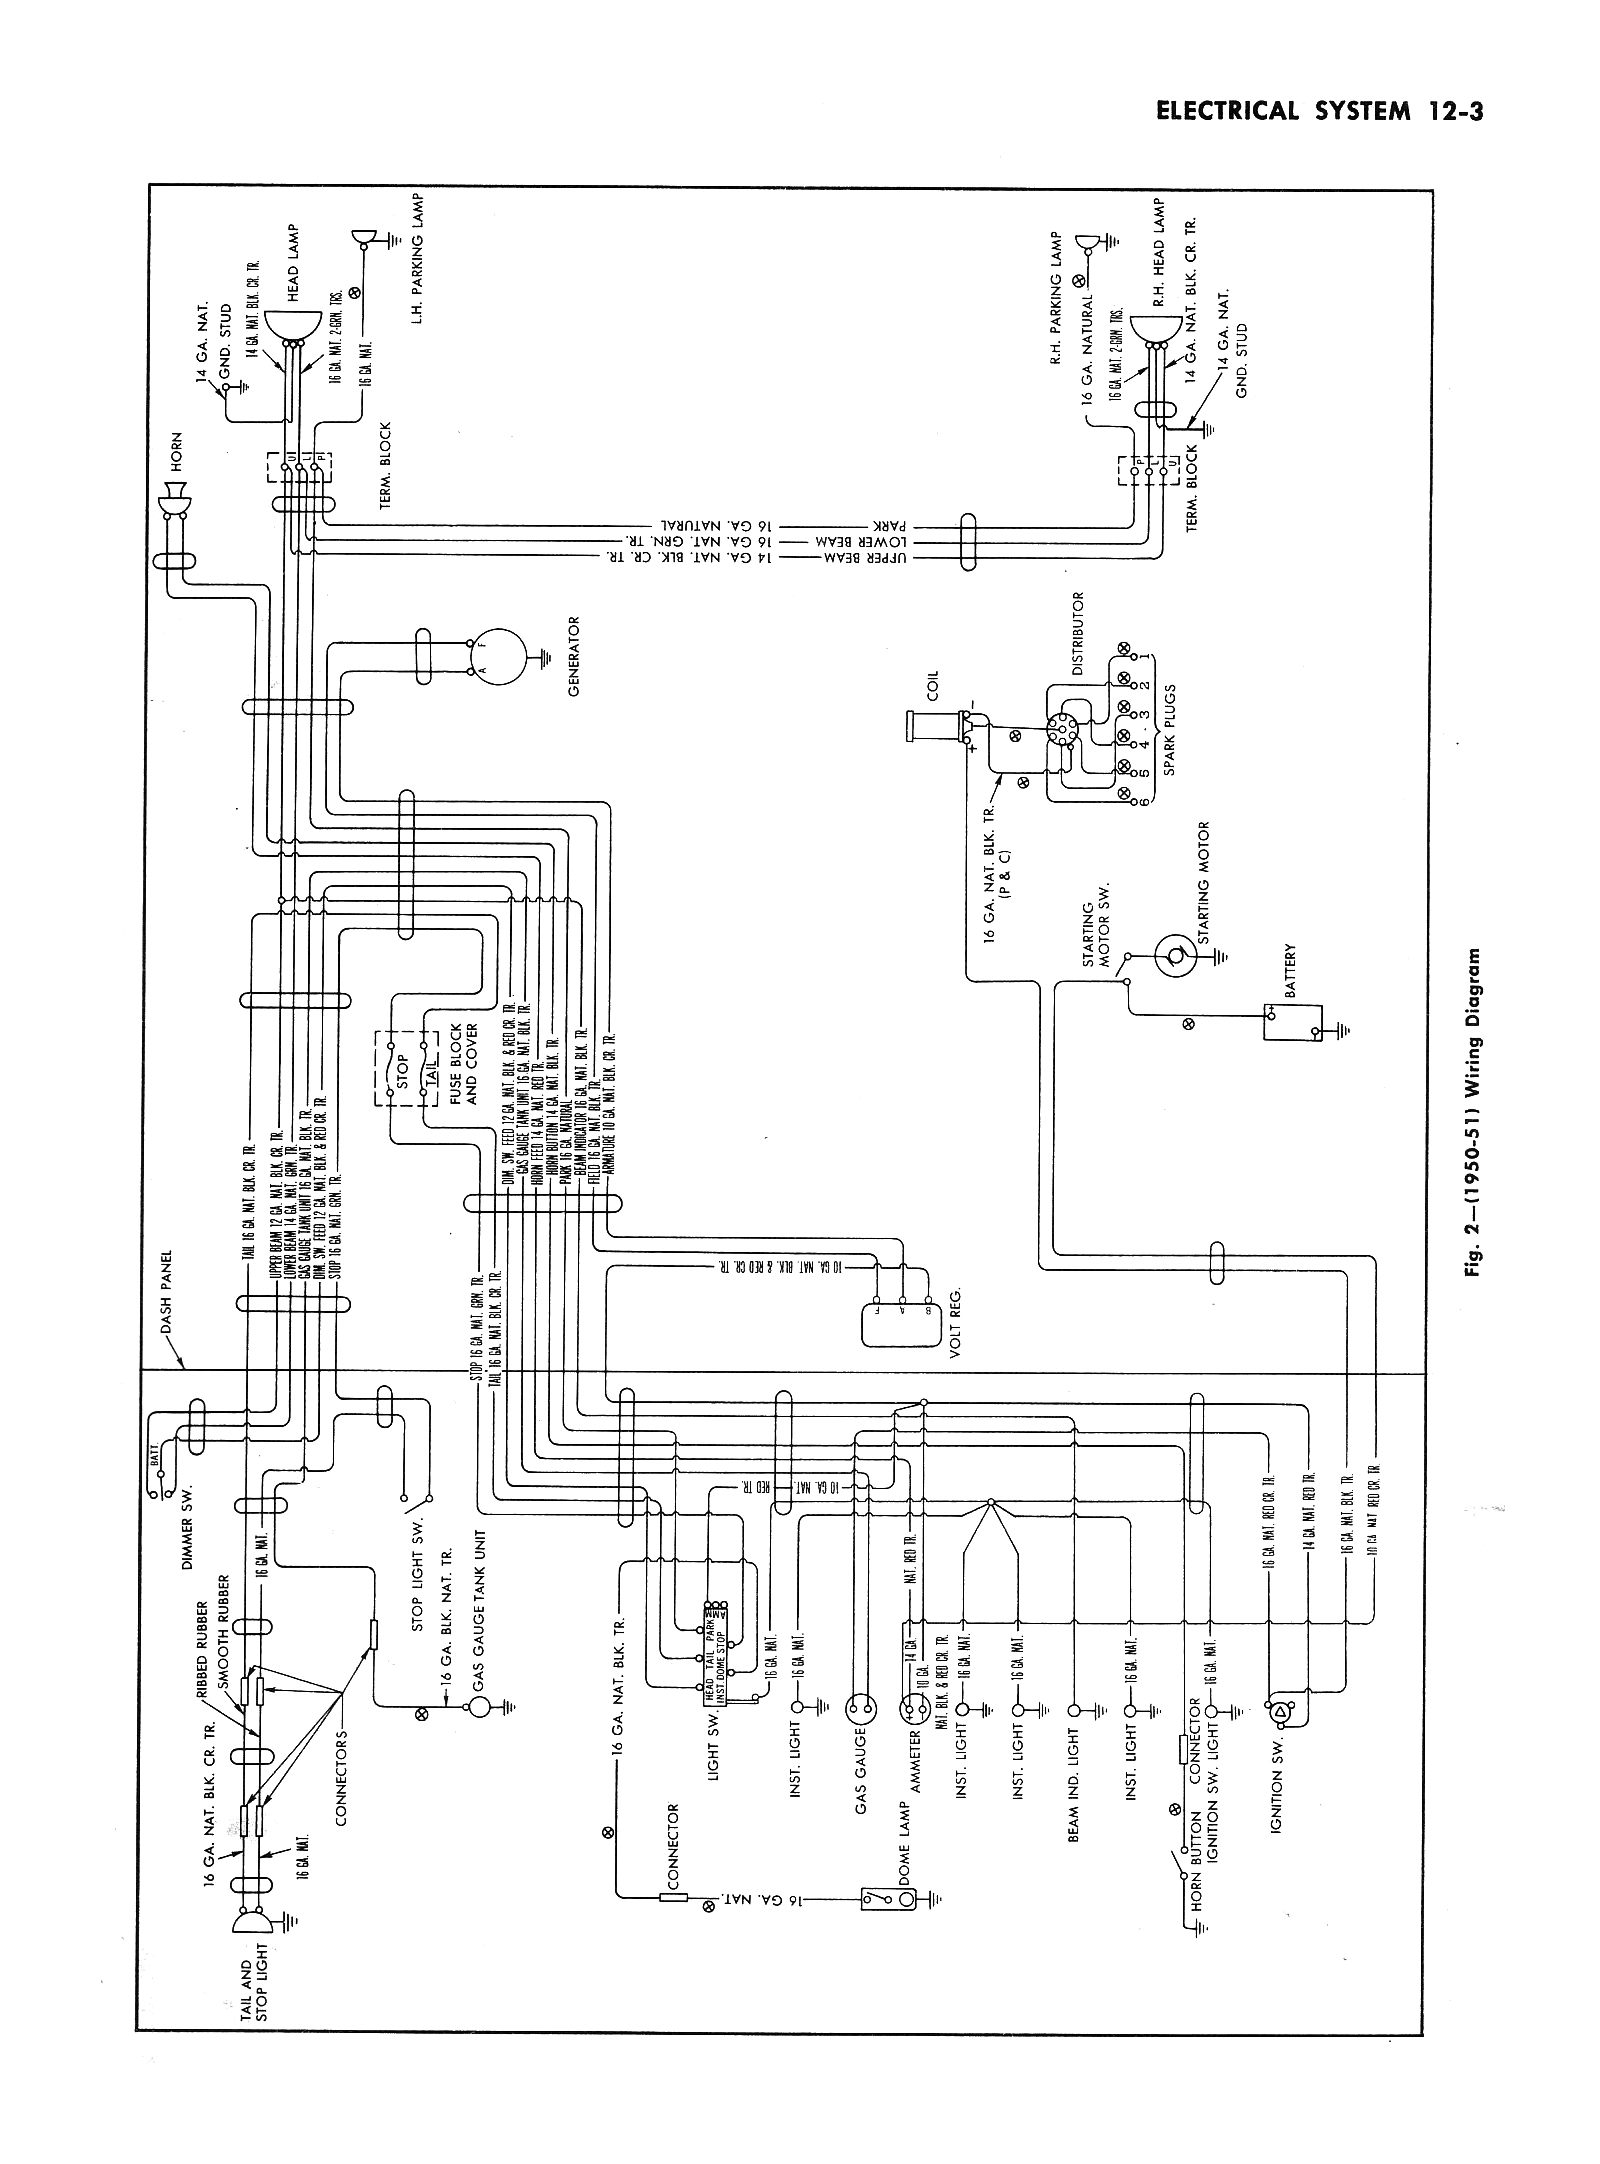 1993 honda accord headlight wiring diagram seymour duncan hot rails stratocaster 2003 turn signal all data library 98